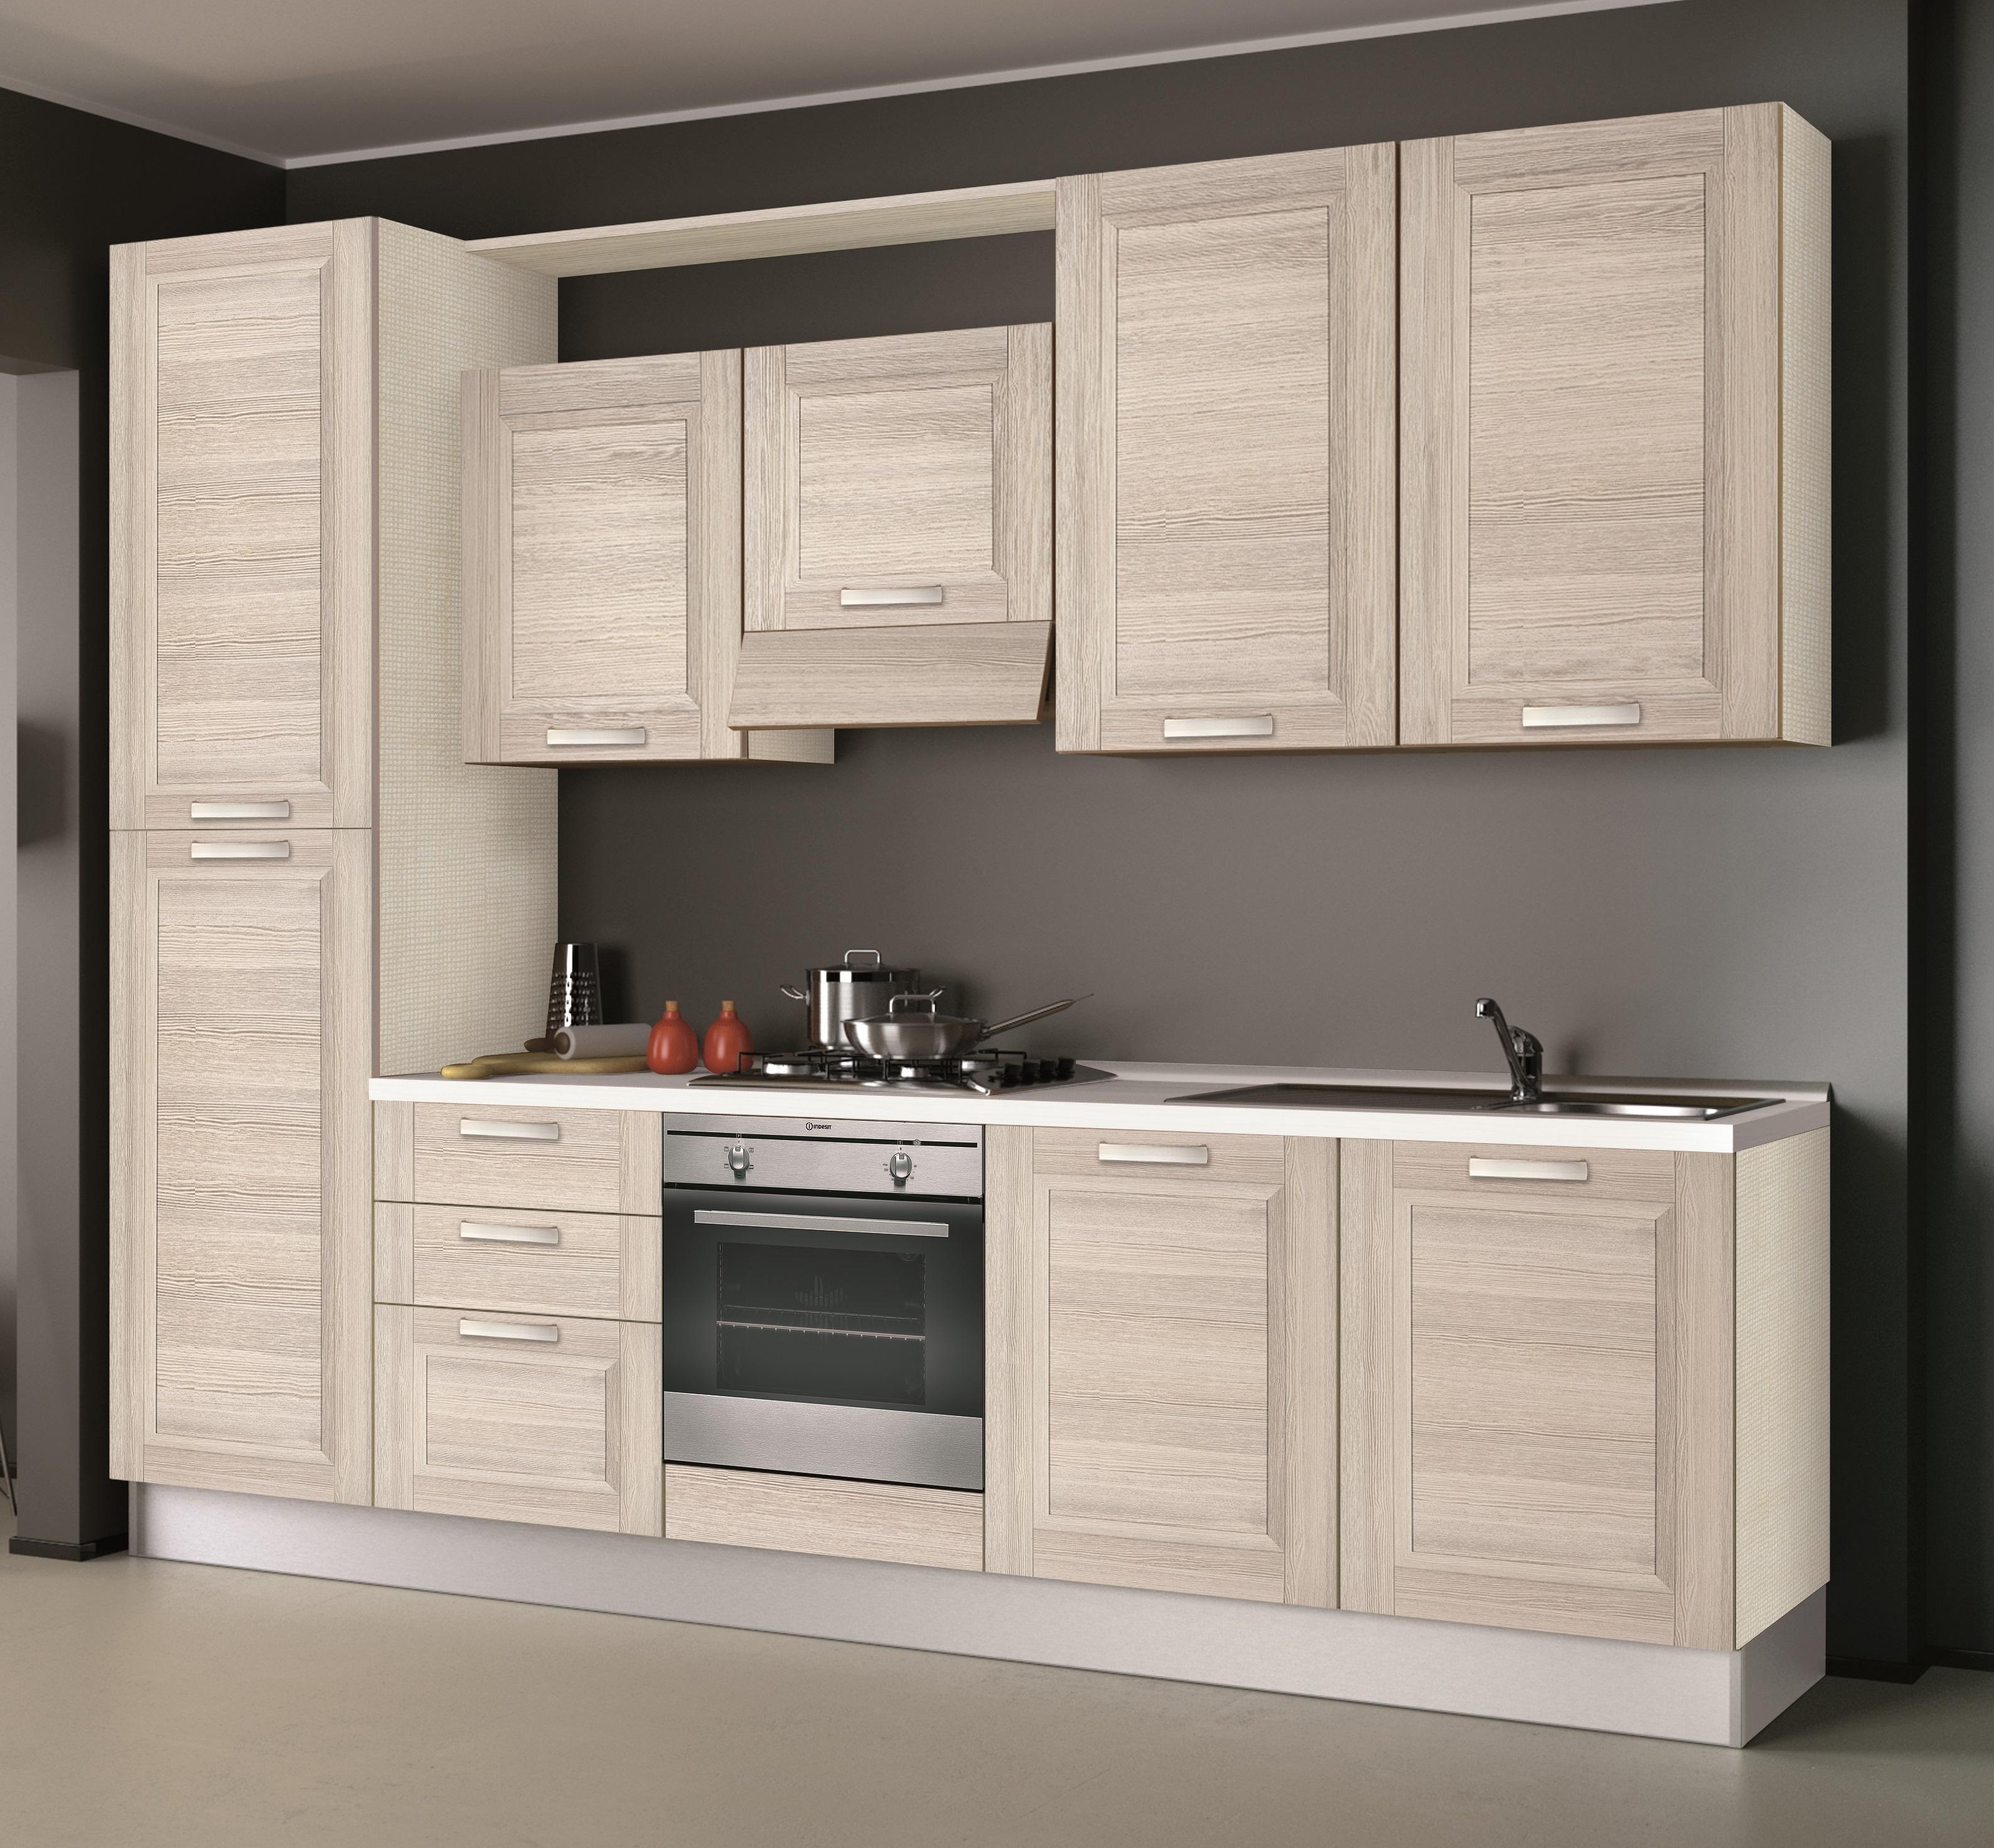 Promo 114 arredamenti centro cucine battistelli eric - Cucina 4 metri lineari prezzi ...